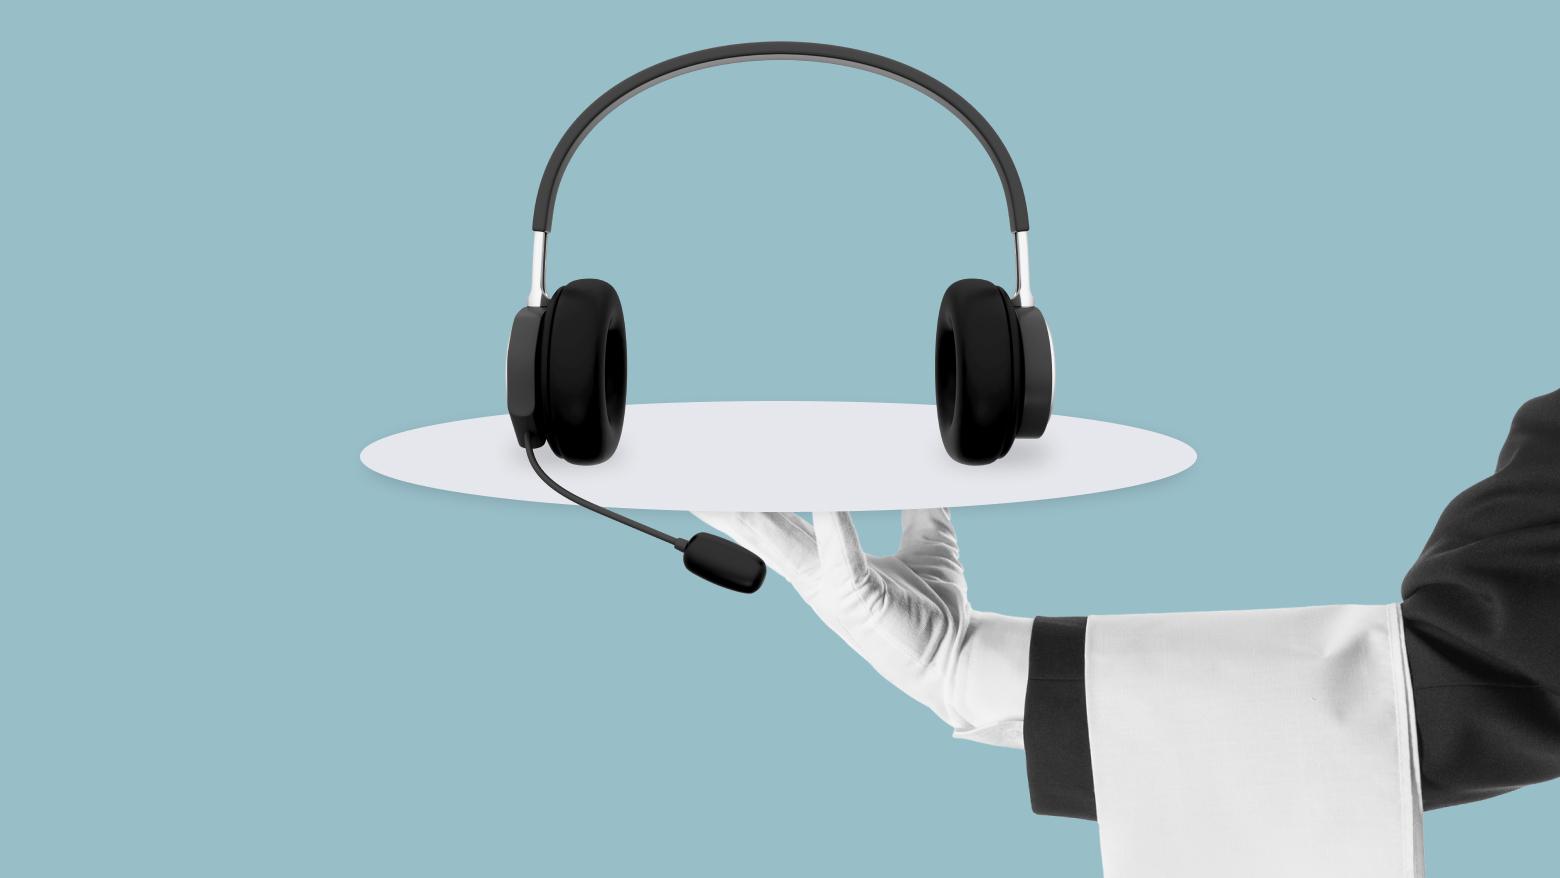 headset on a platter